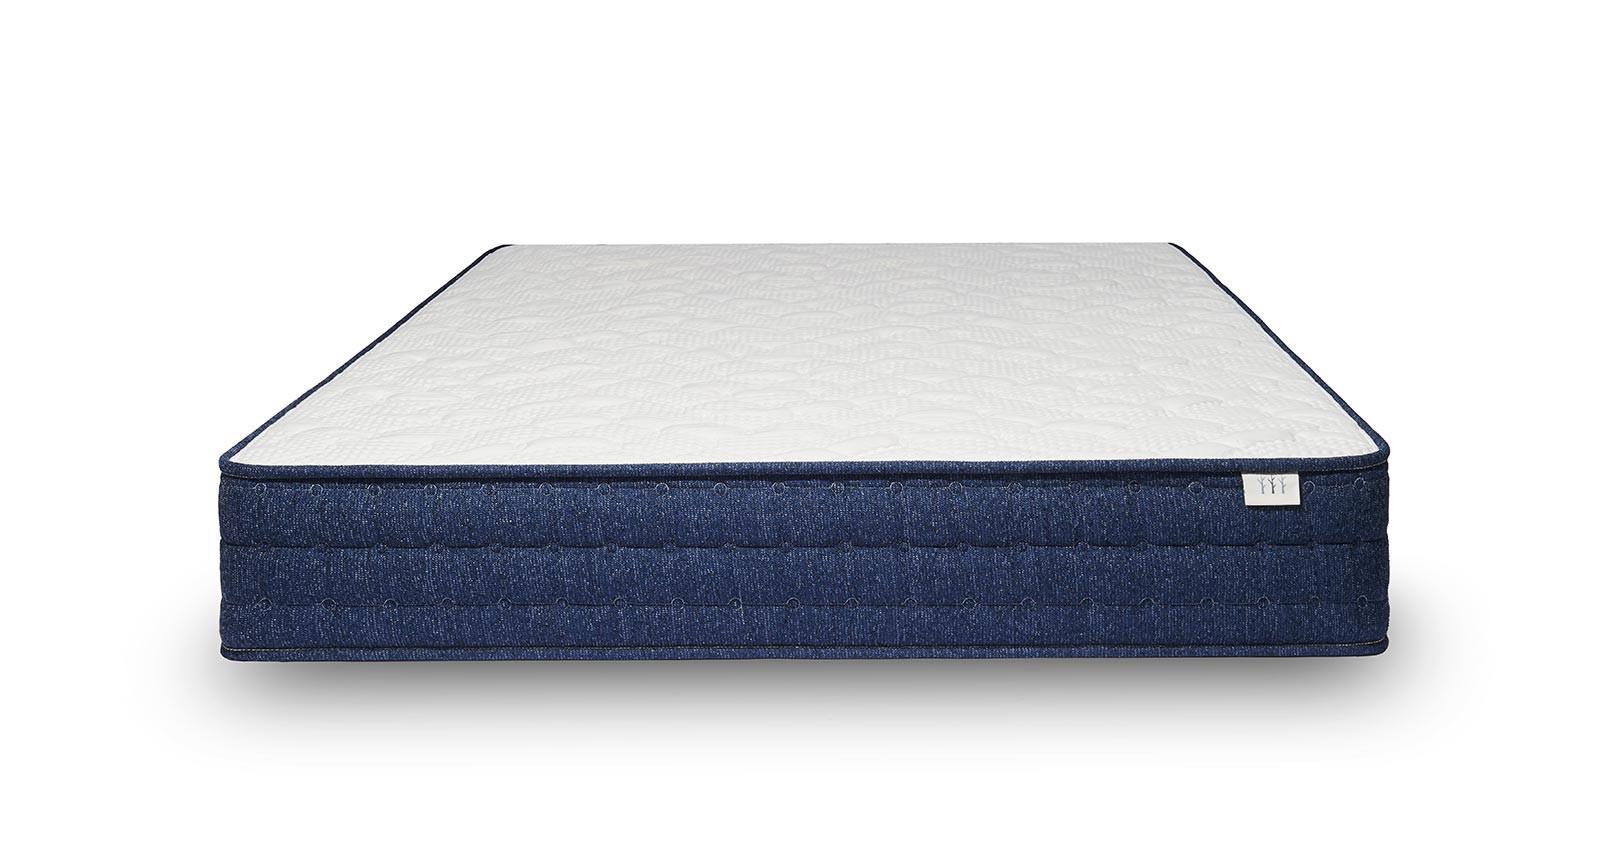 brentwood brentwoodhomememoryfoammattress reviews home sequoia review mattress construction